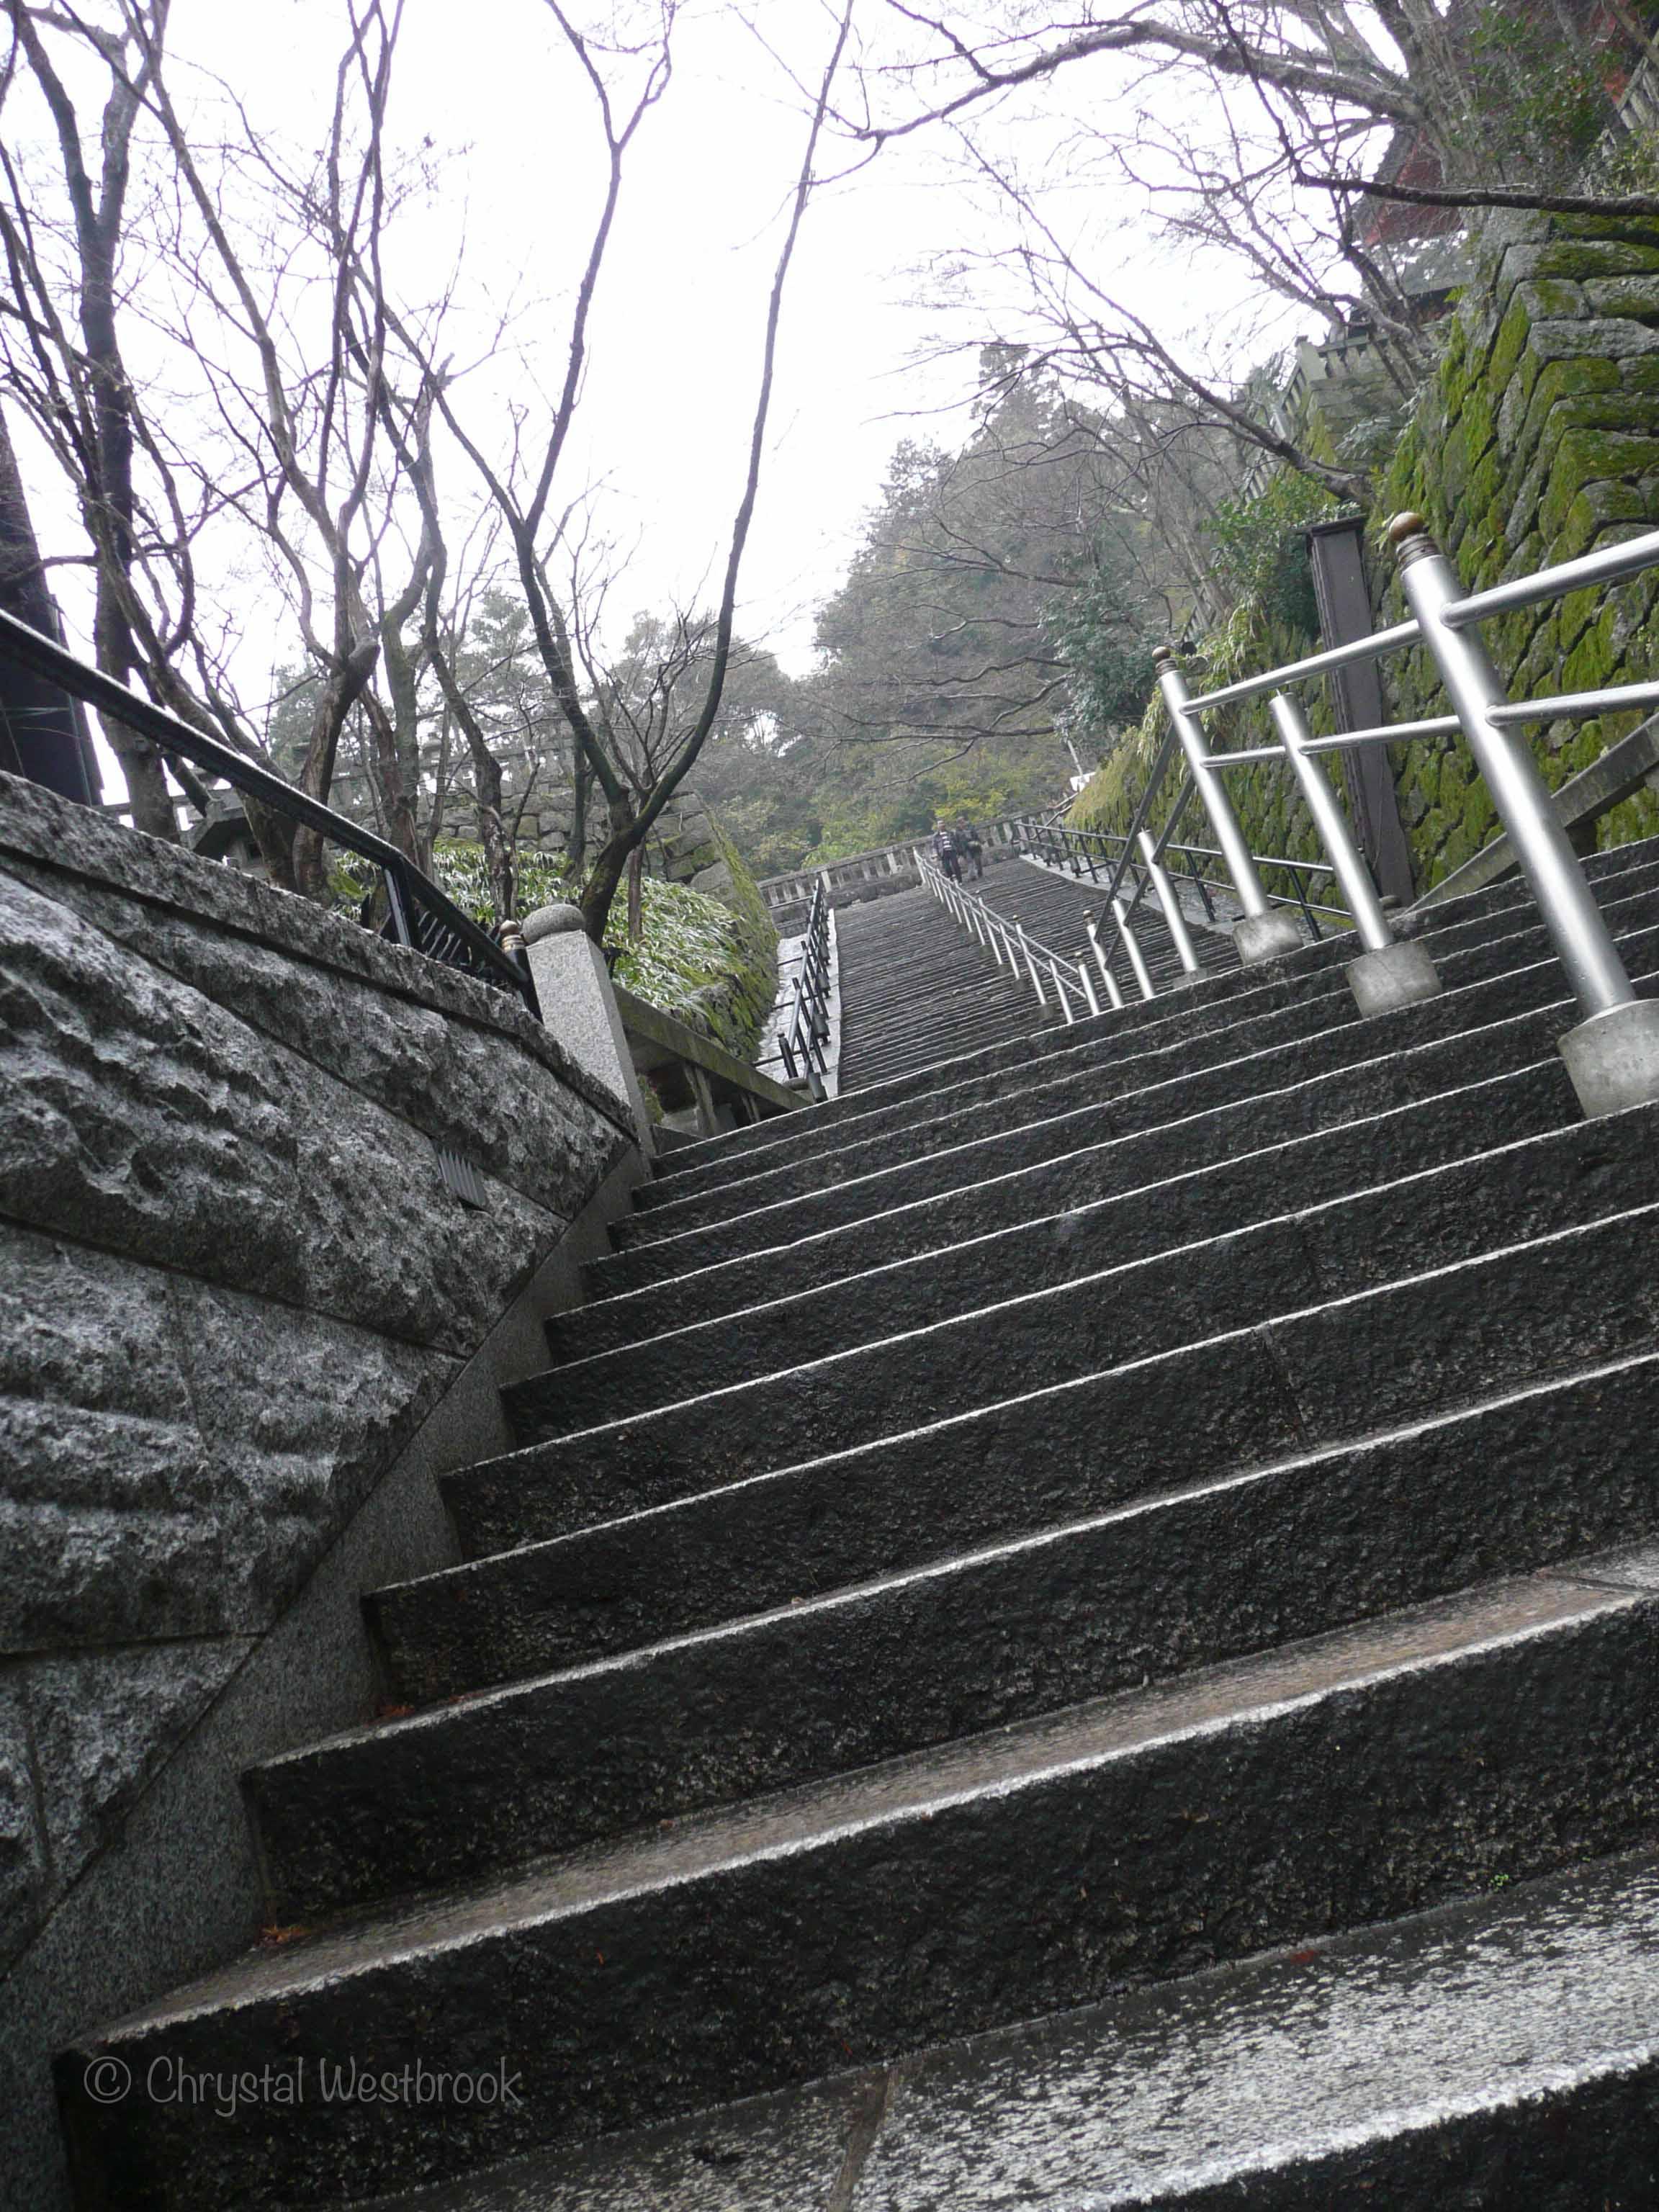 [IMAGE] Staircase in a Kyoto garden